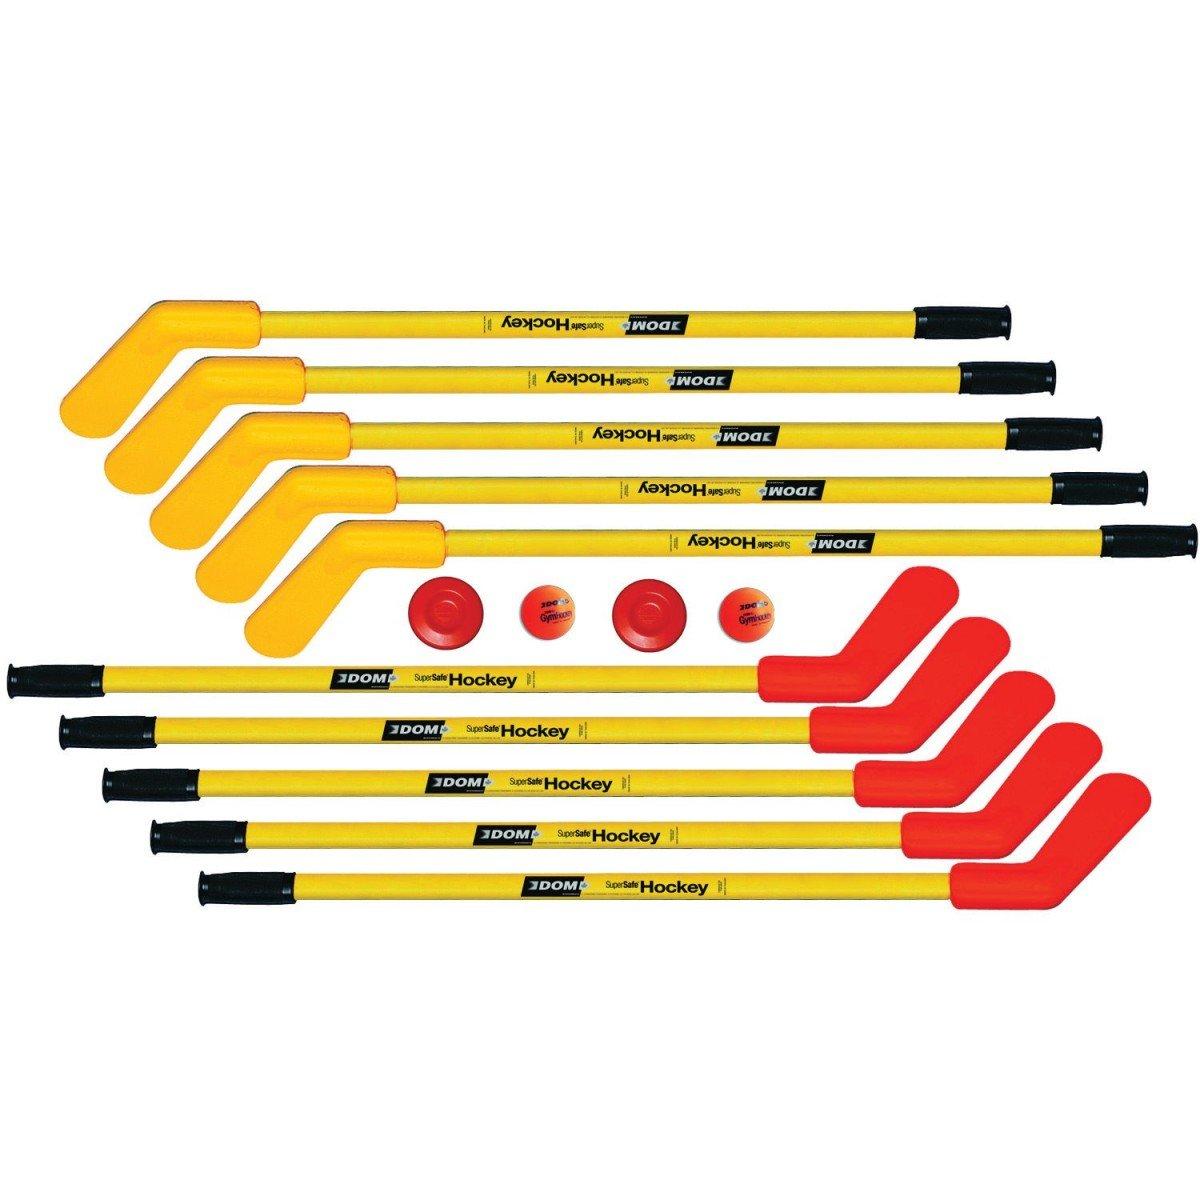 DOM SS360A 36'' Super-Safe Hockey Set, Includes 10 Sticks, 2 Super Safe Pucks and 2 Balls, Up to Age 12 (Pack of 36)